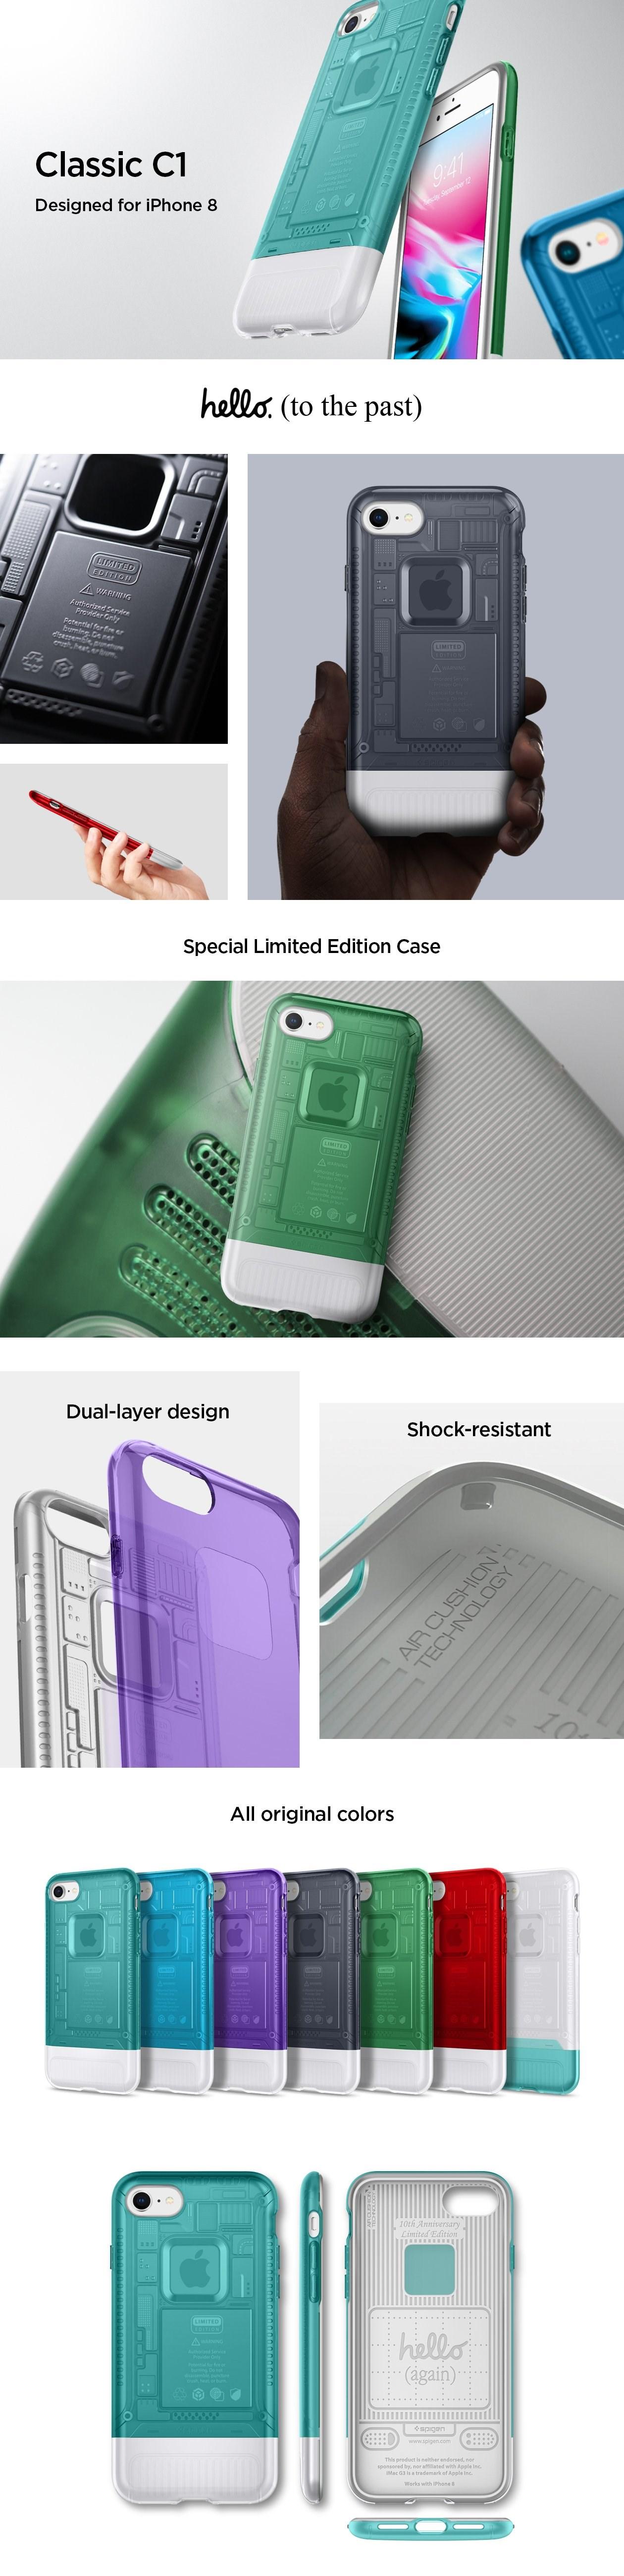 SPIGEN - iPhone 7/8 Case Classic C1, Bondi Blue (054CS24401)